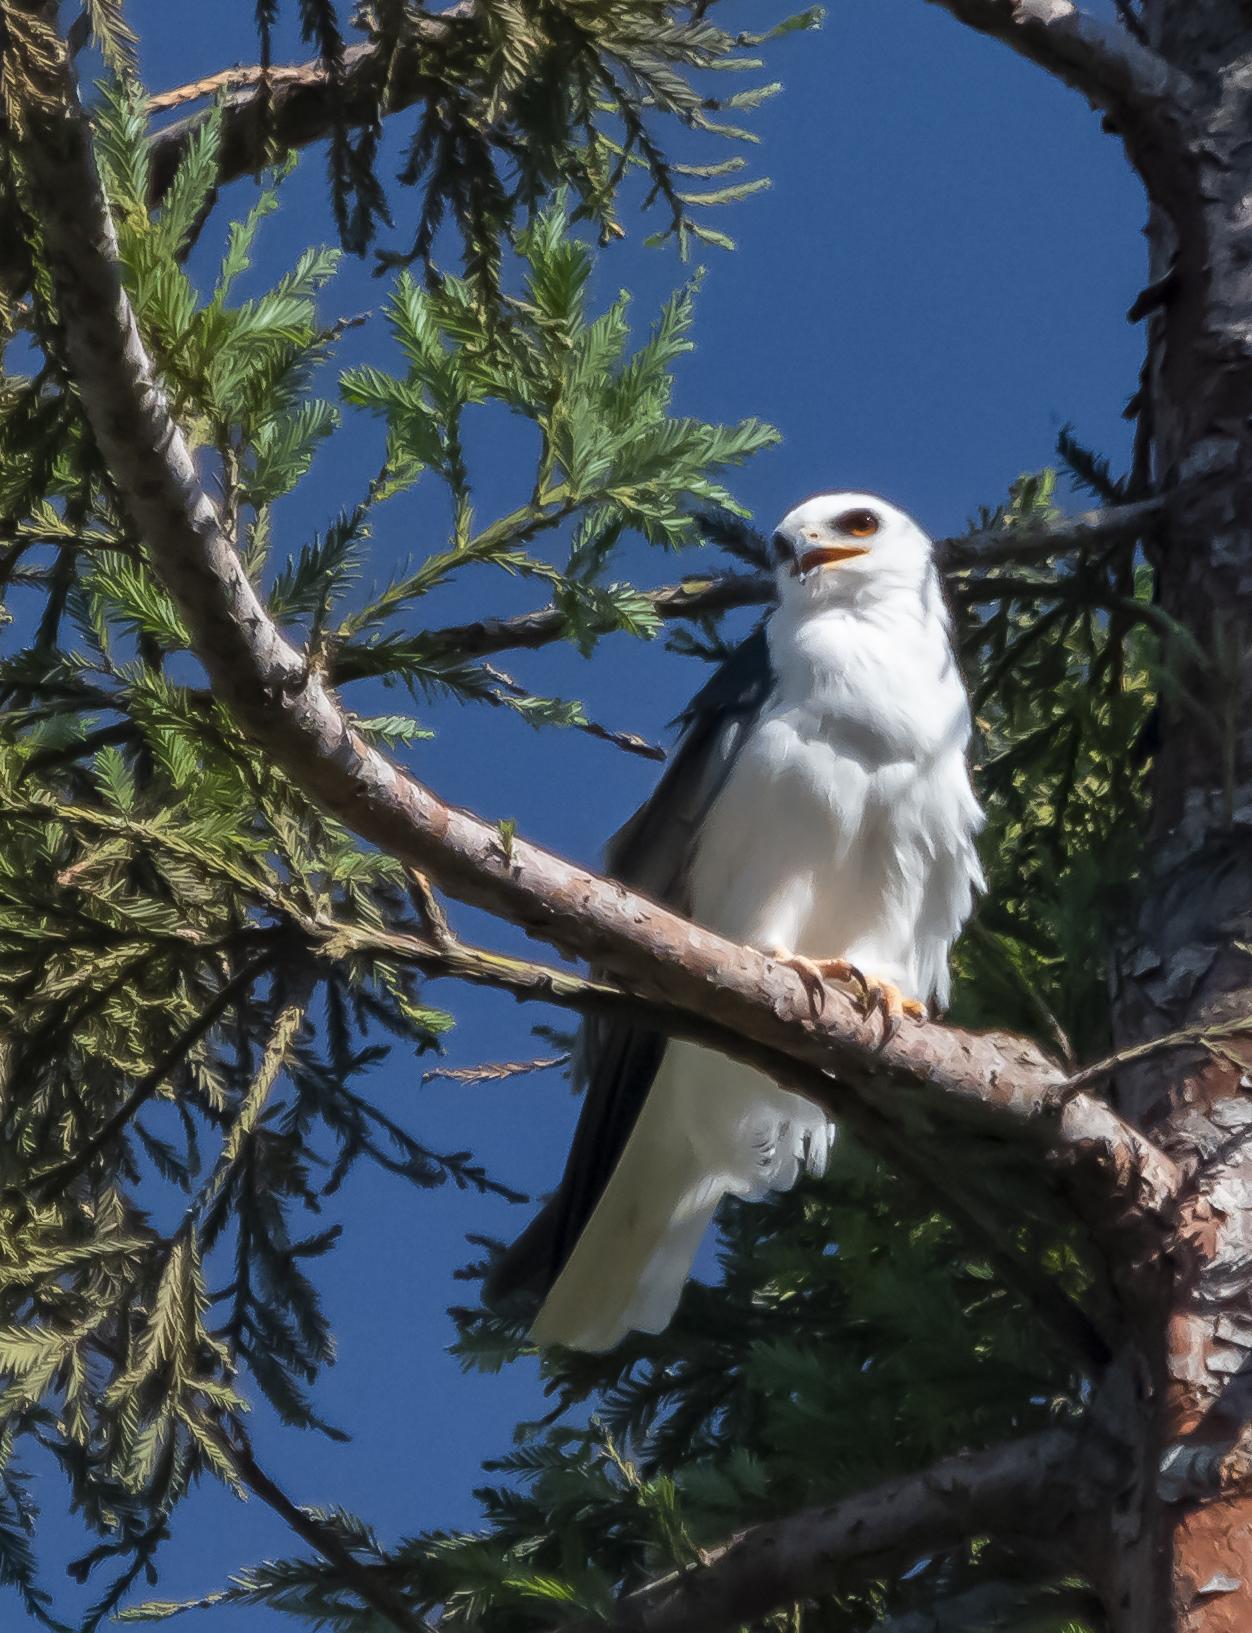 White-tailed Kite in San Jose, California